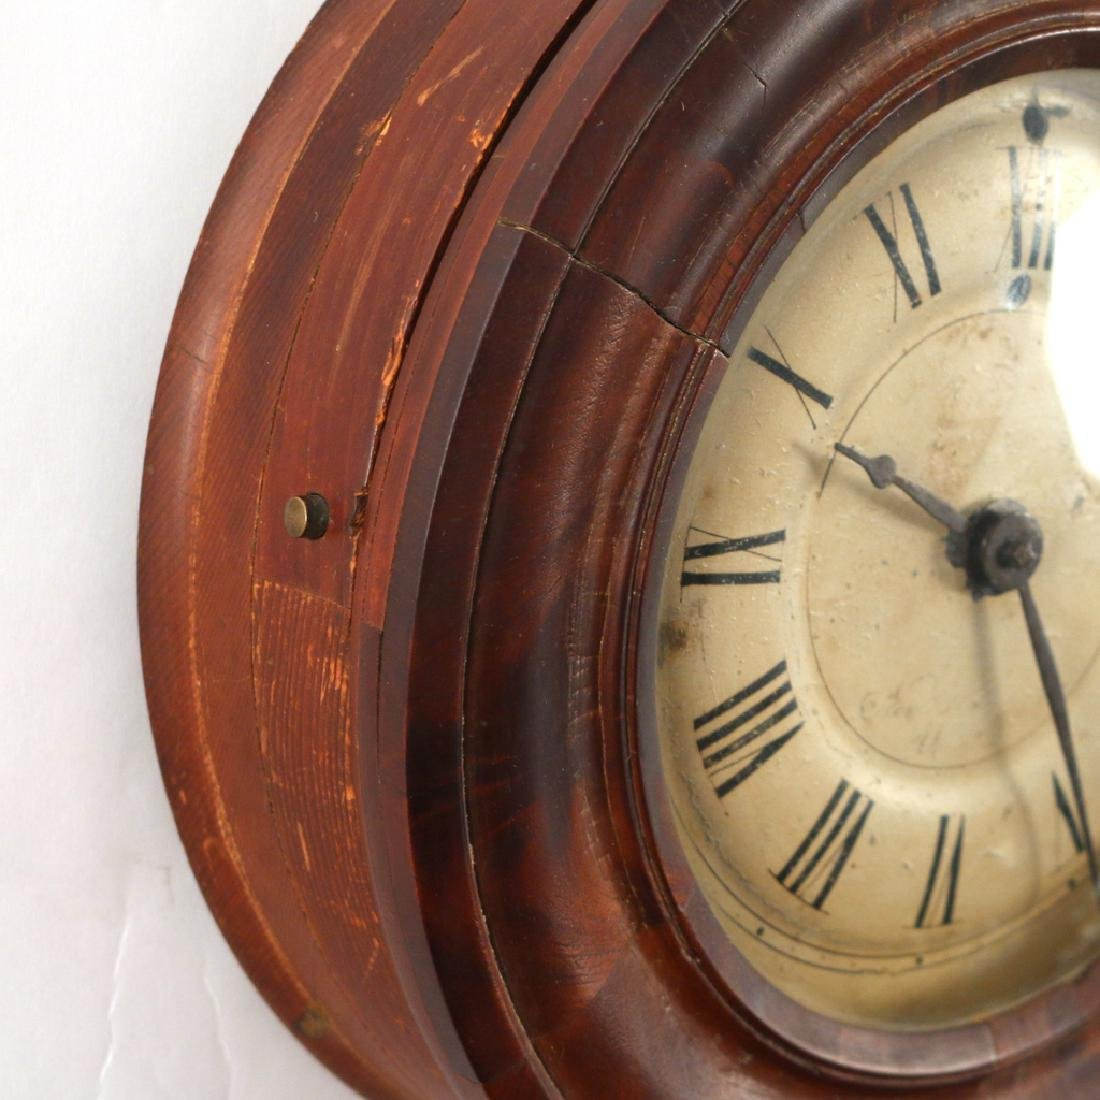 KIRK'S PATENT MARINE TIMEPIECE - 3